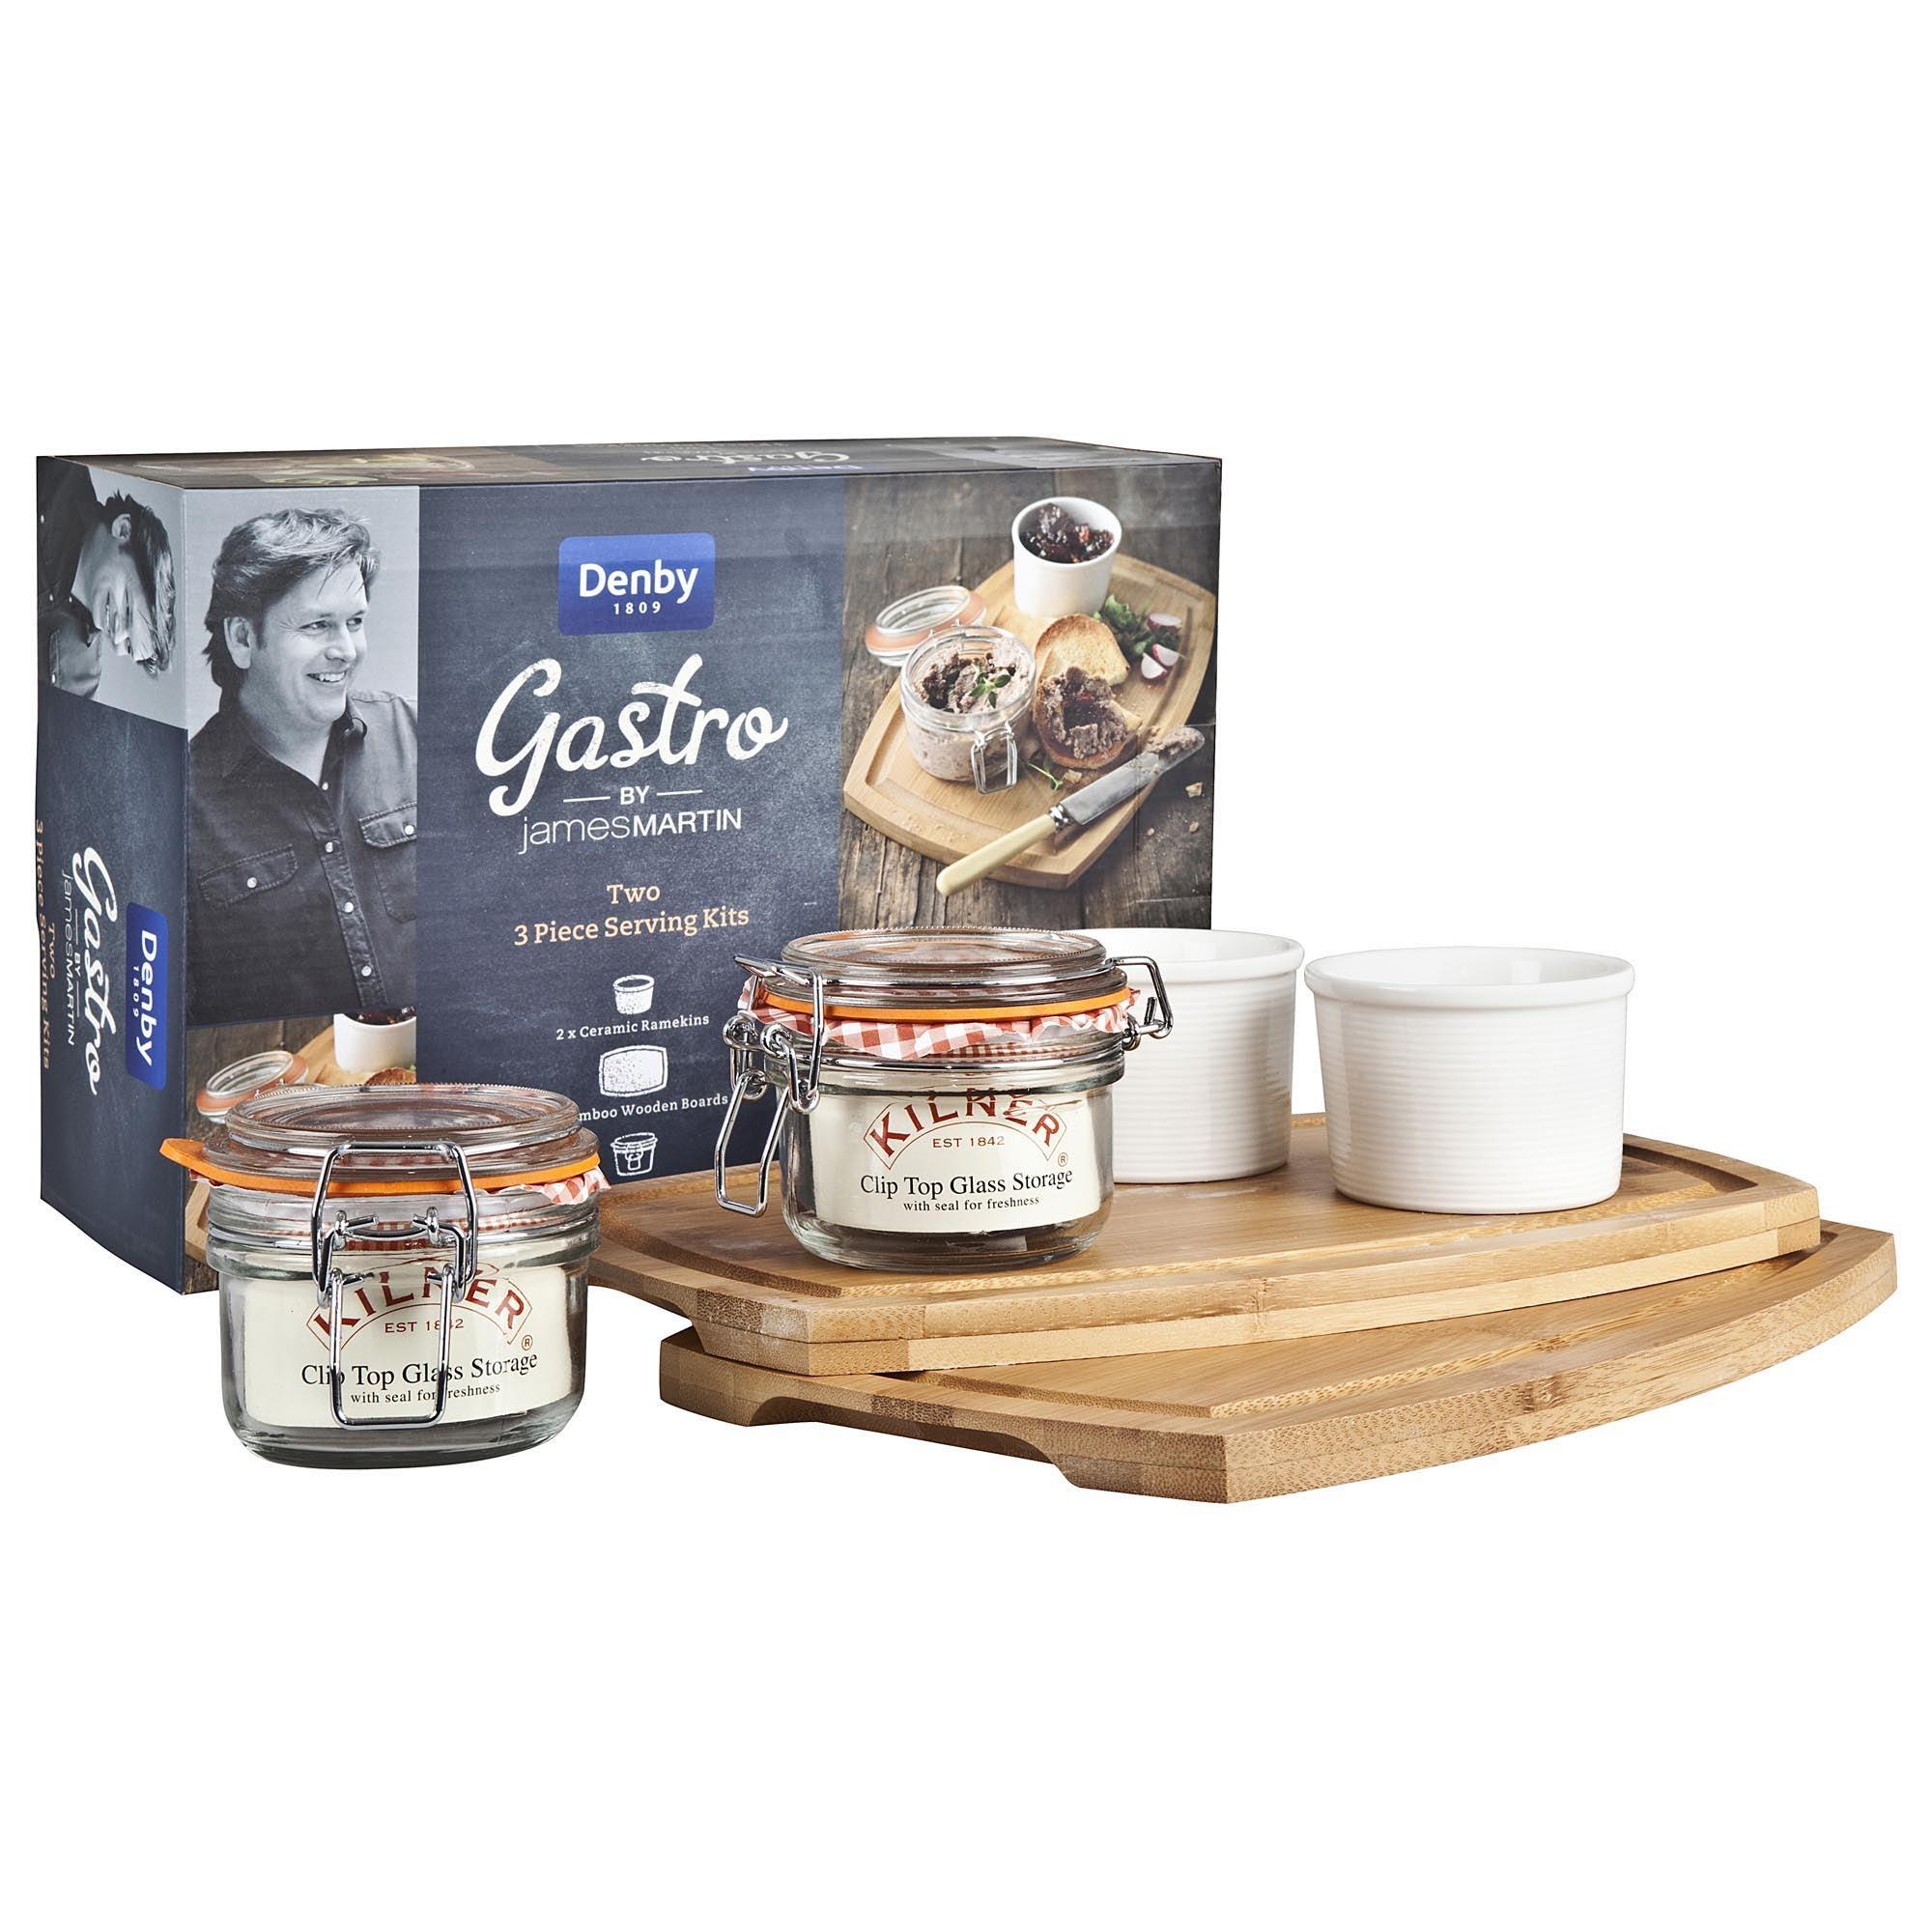 Image of Denby James Martin Gastro 3 Piece Serving Kit Cream